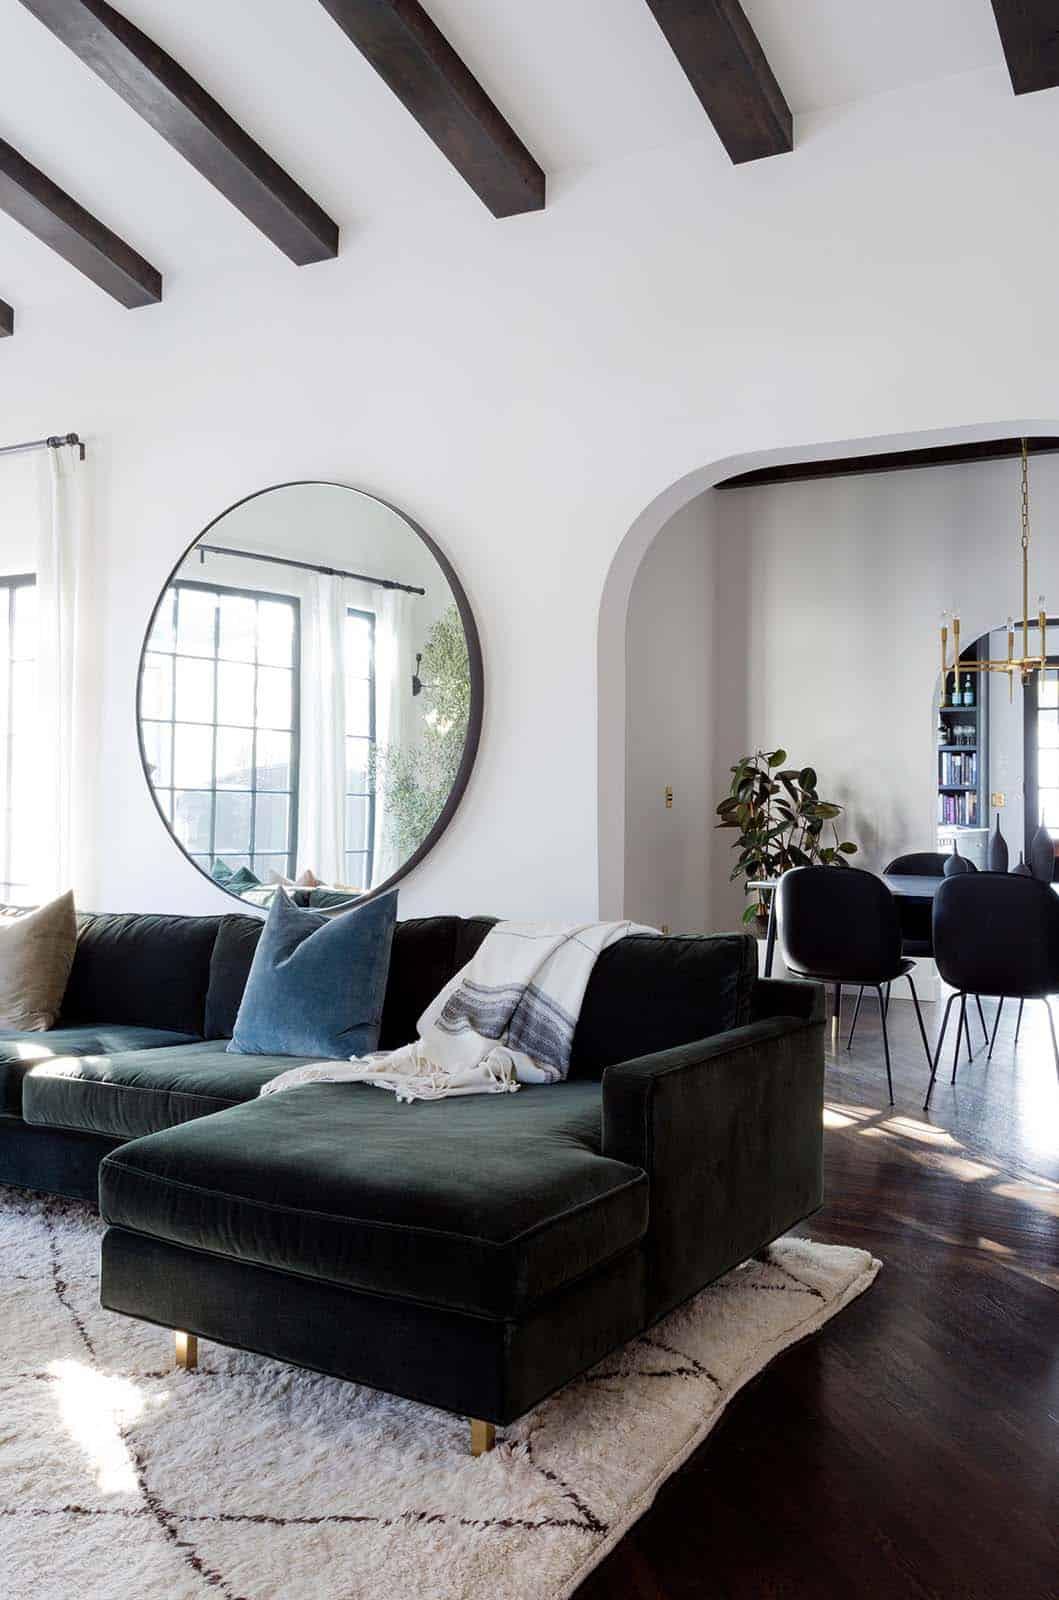 Style espagnol Home-Jette Creative-05-1 Kindesign